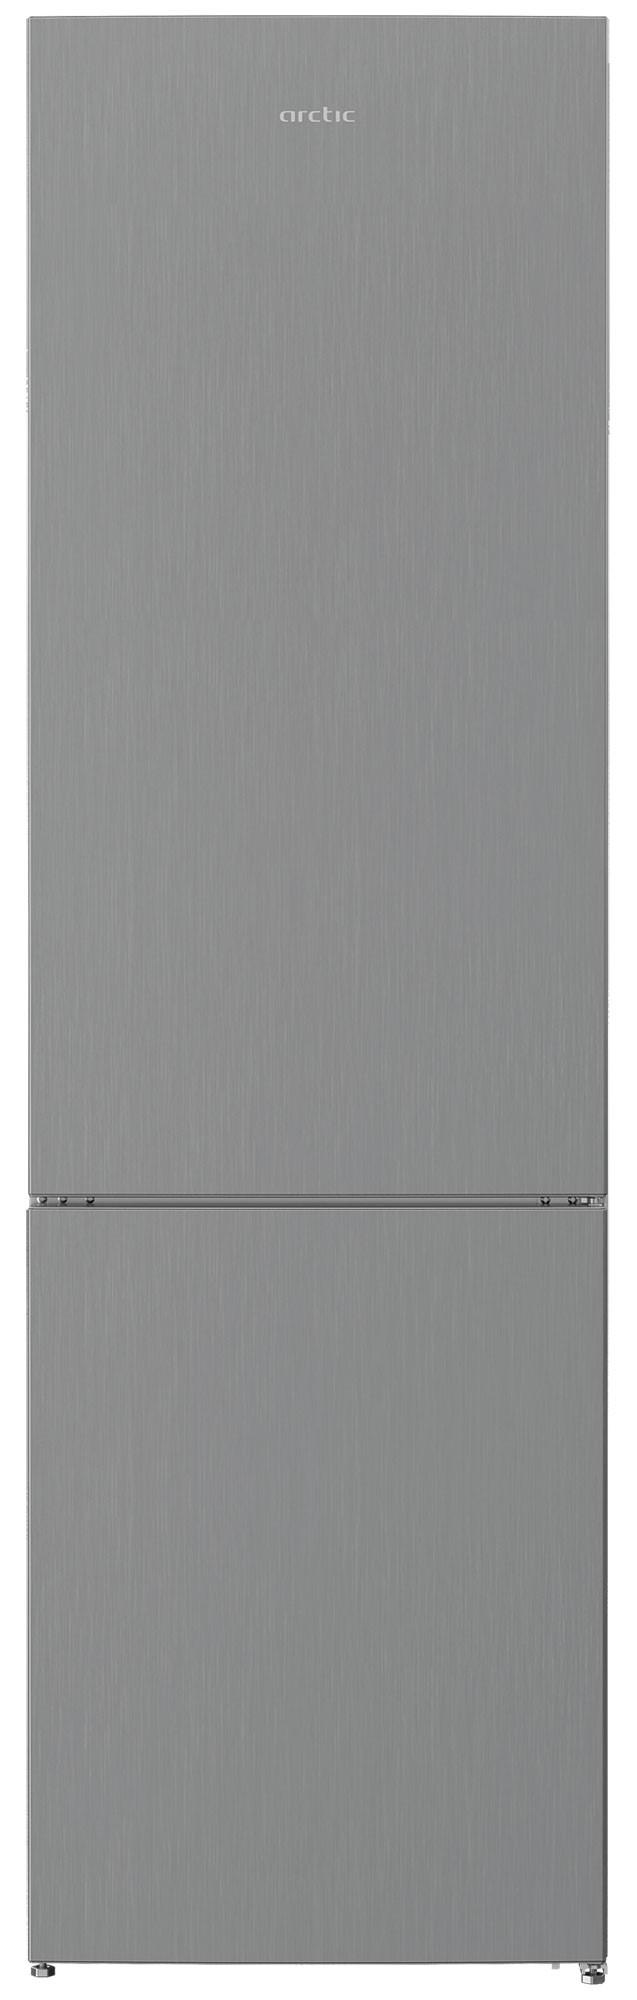 Combina frigorifica, Arctic, AK60360M30MT, 339 l, Clasa F, H 200,9 cm, Gri